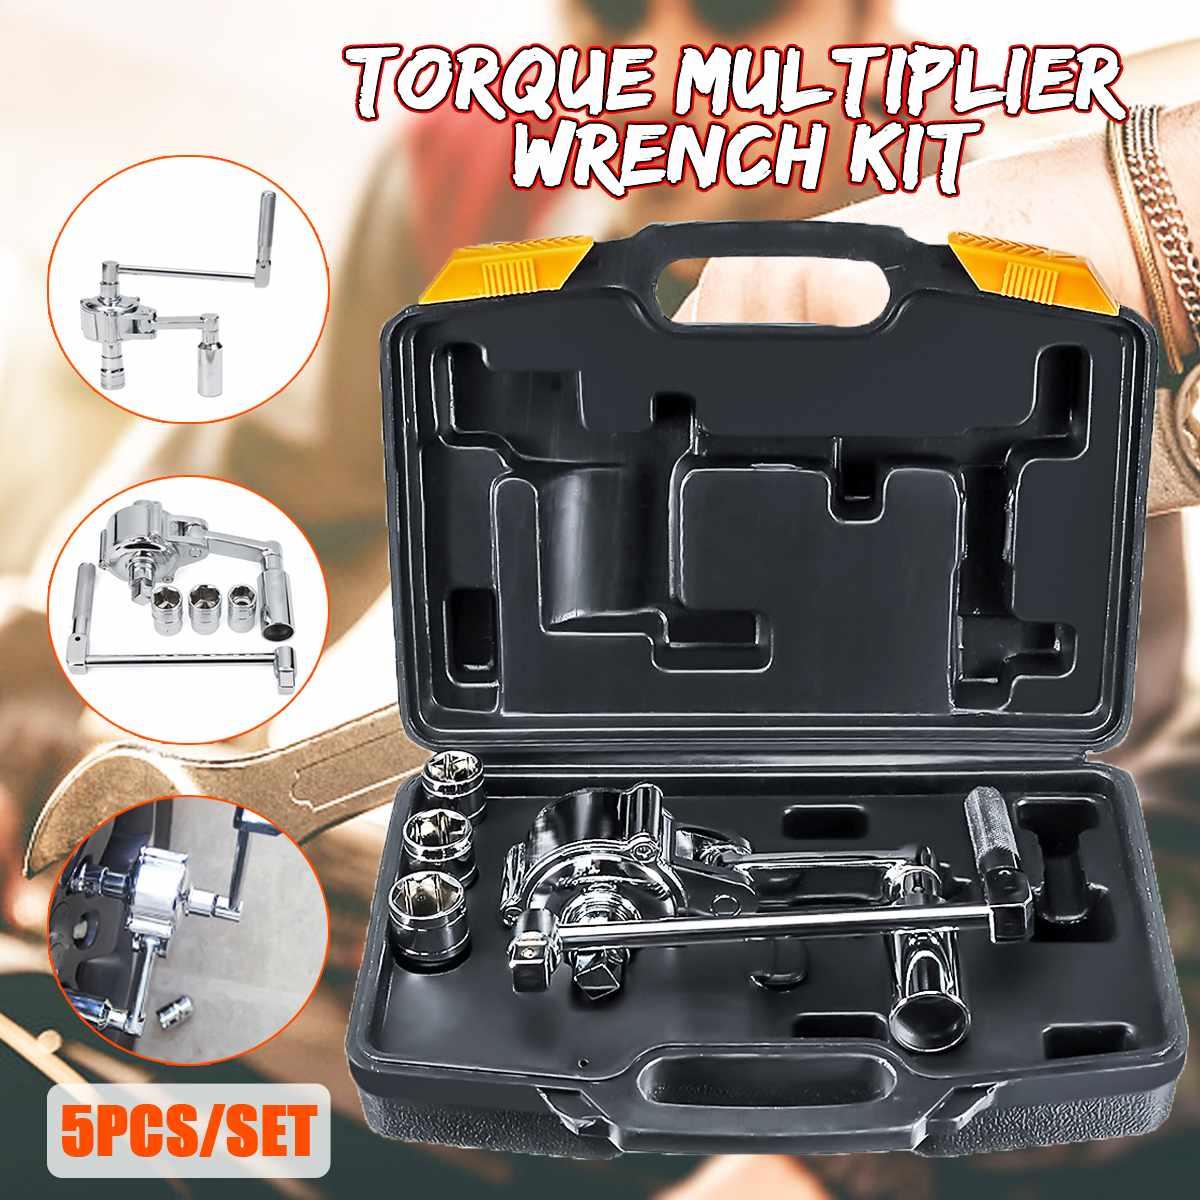 Autoleader Torque Multiplier Wrench Lug Nut Remover 1/2 Drive Socket 17 19 21mm Tire Change